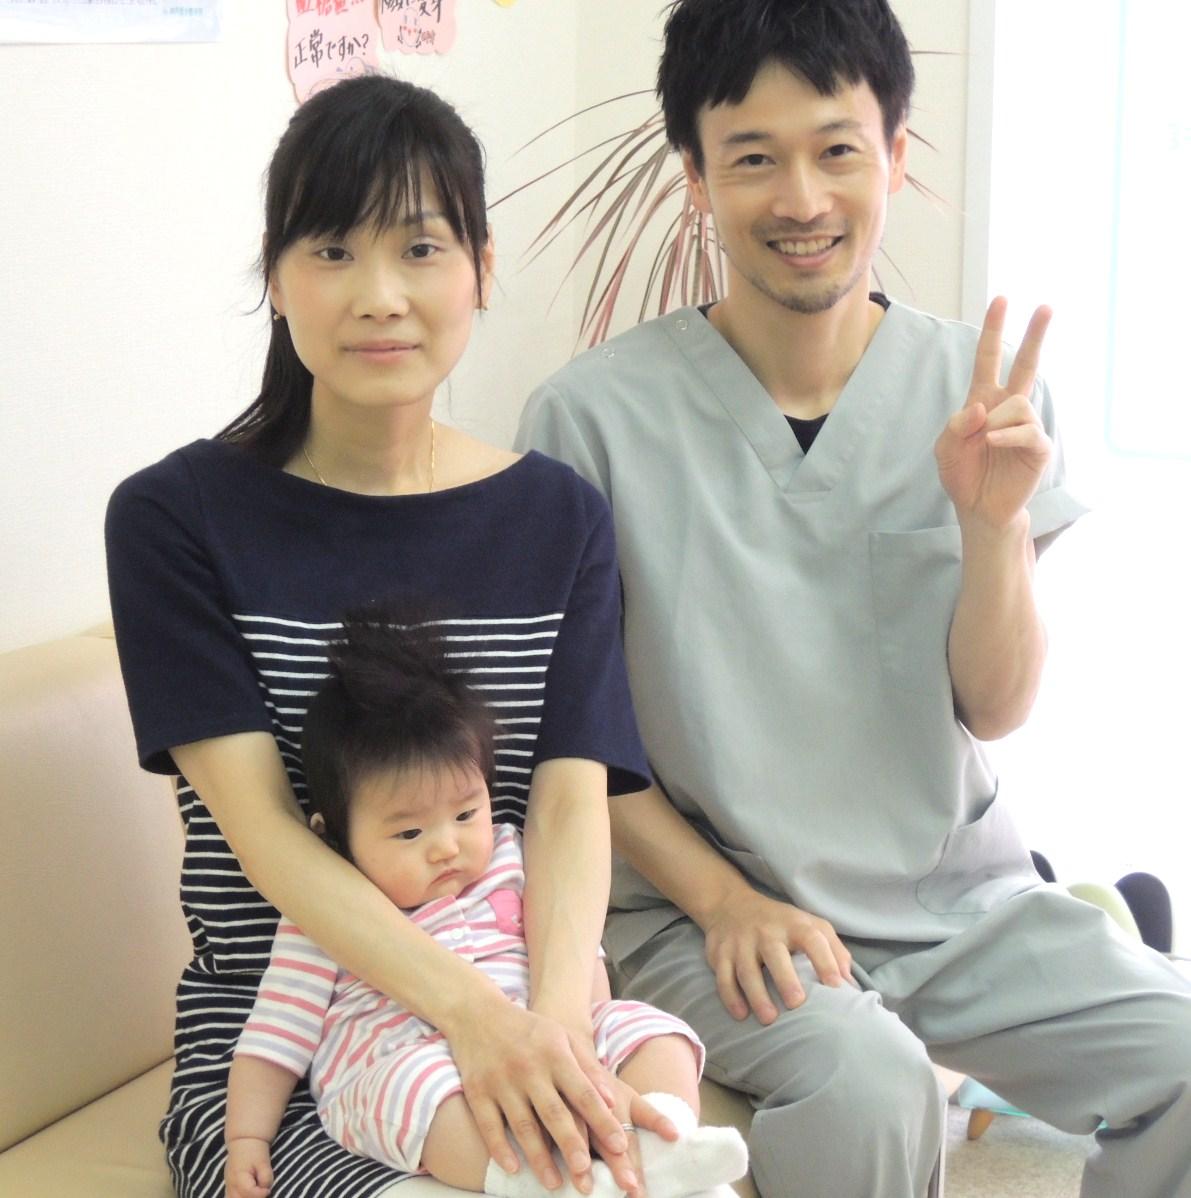 産後骨盤矯正 Tさま 神戸市  神戸垂水整体院